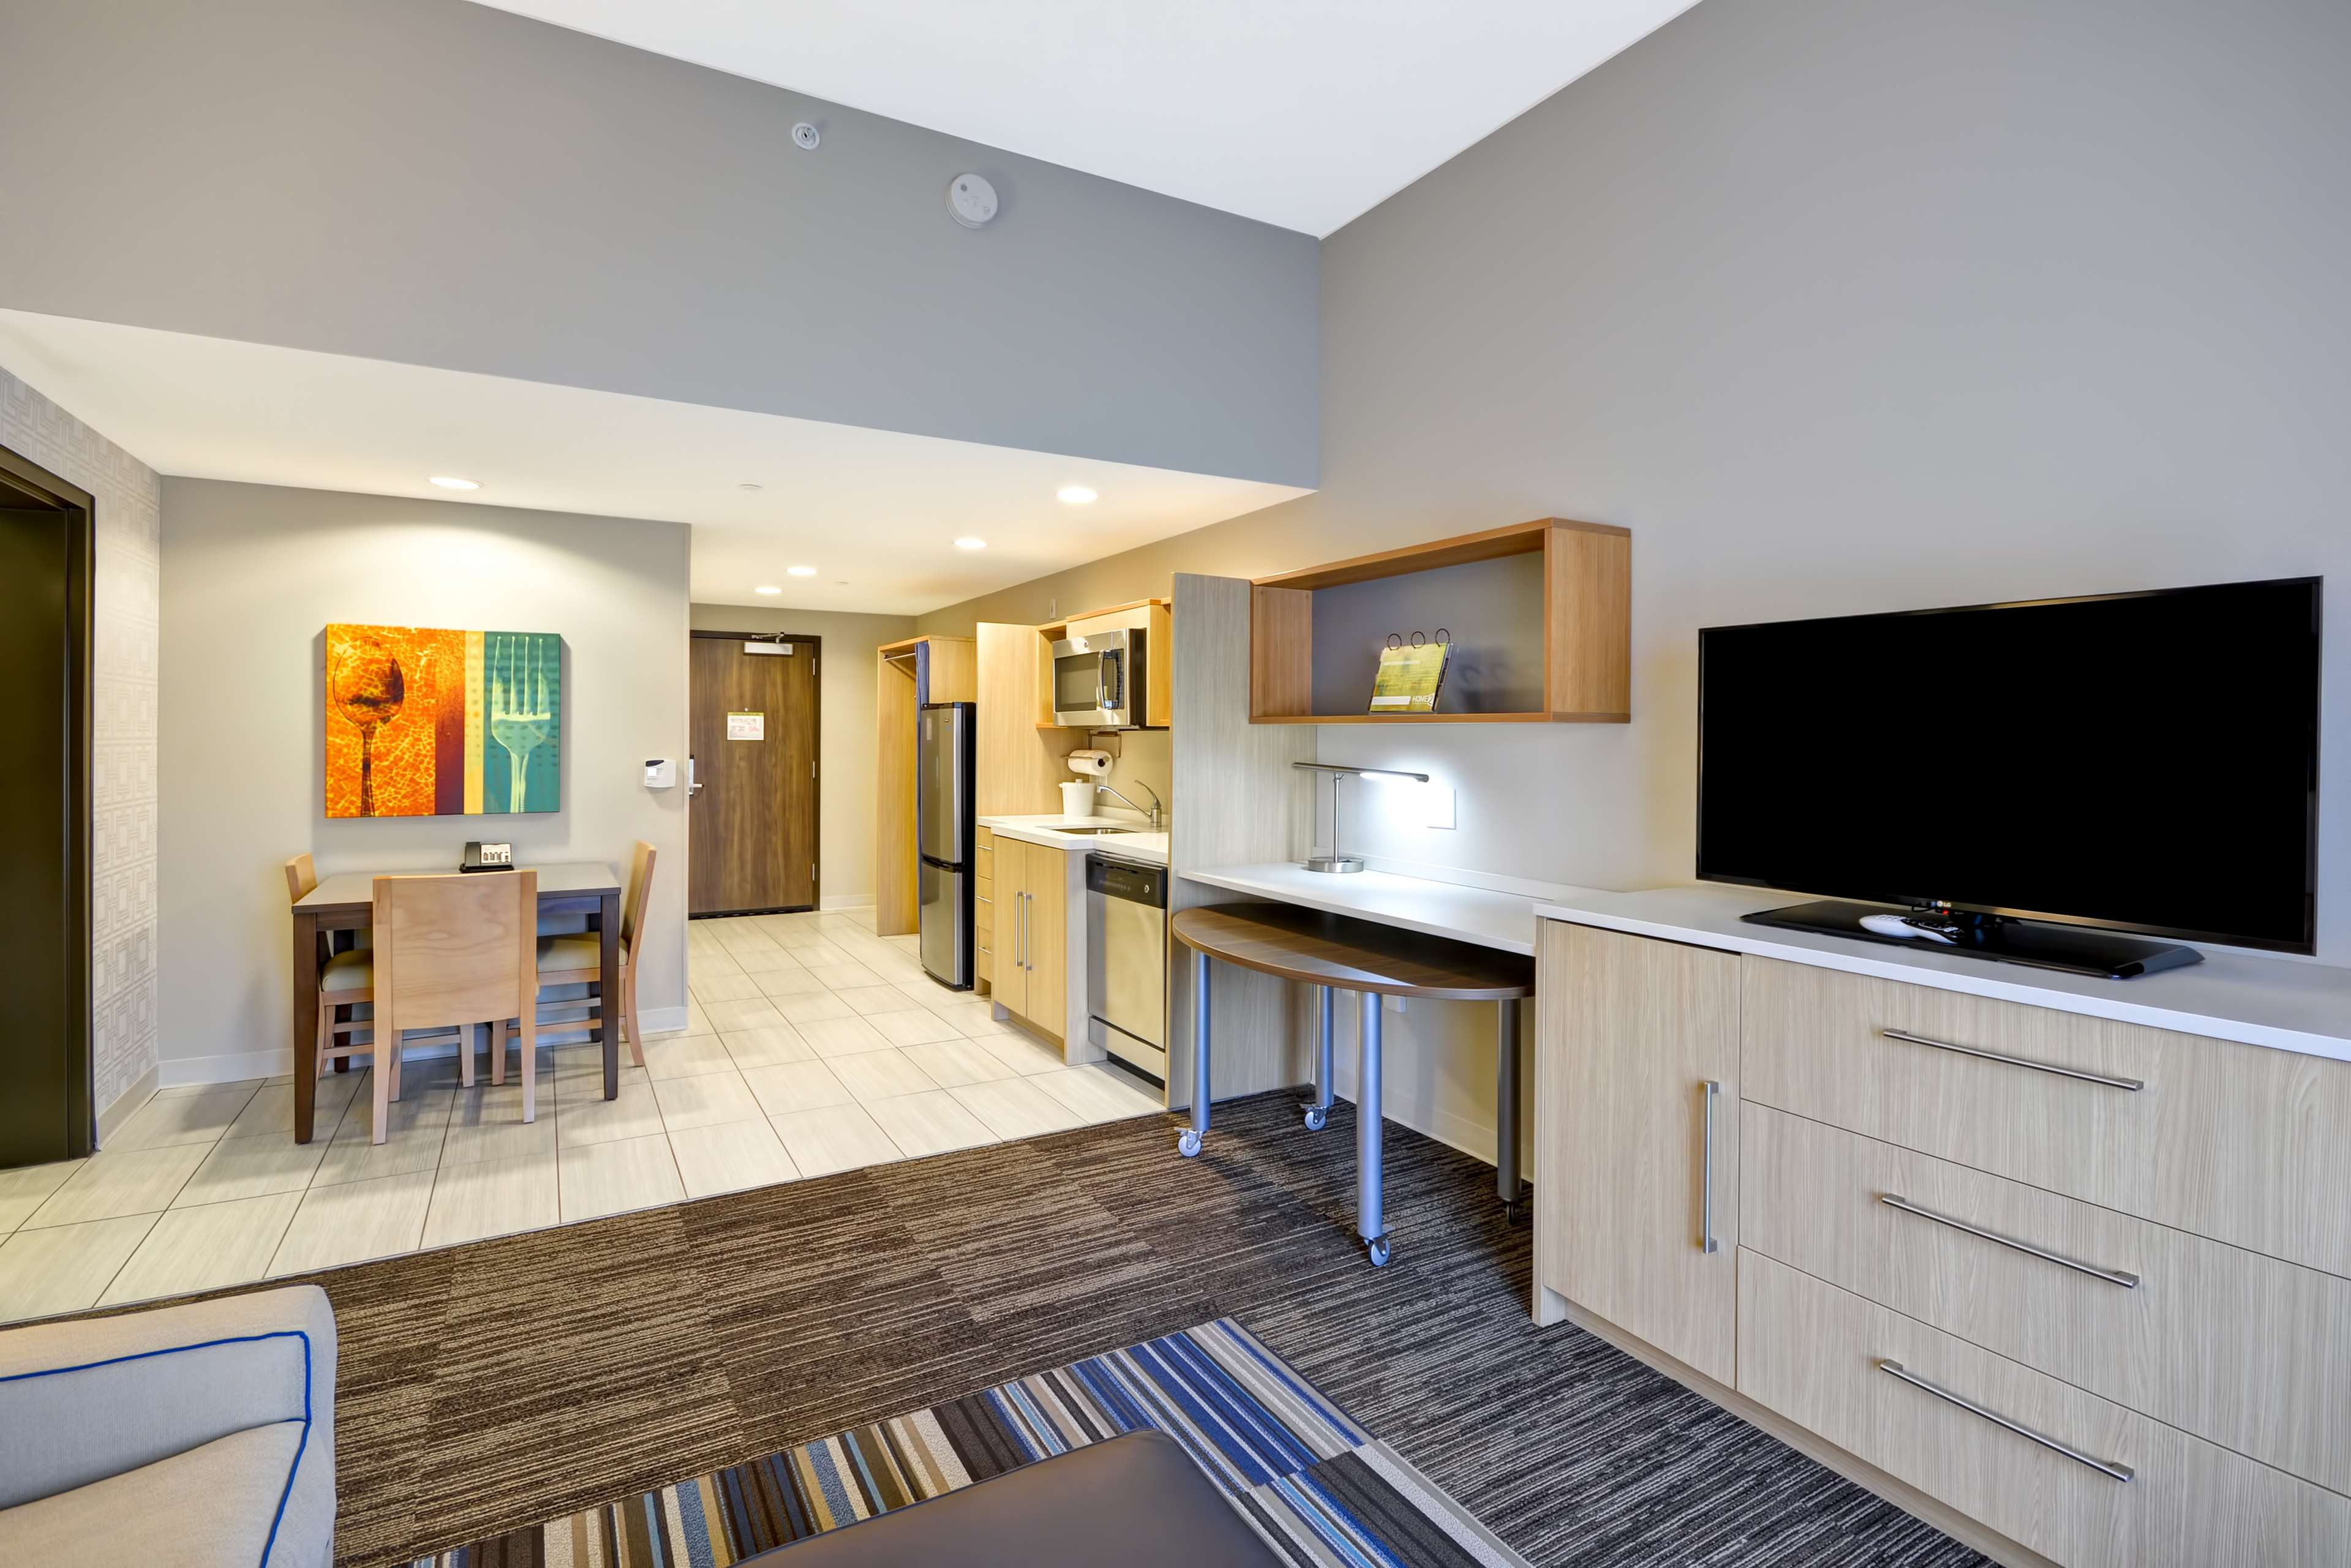 Home2 Suites by Hilton  St. Simons Island image 29